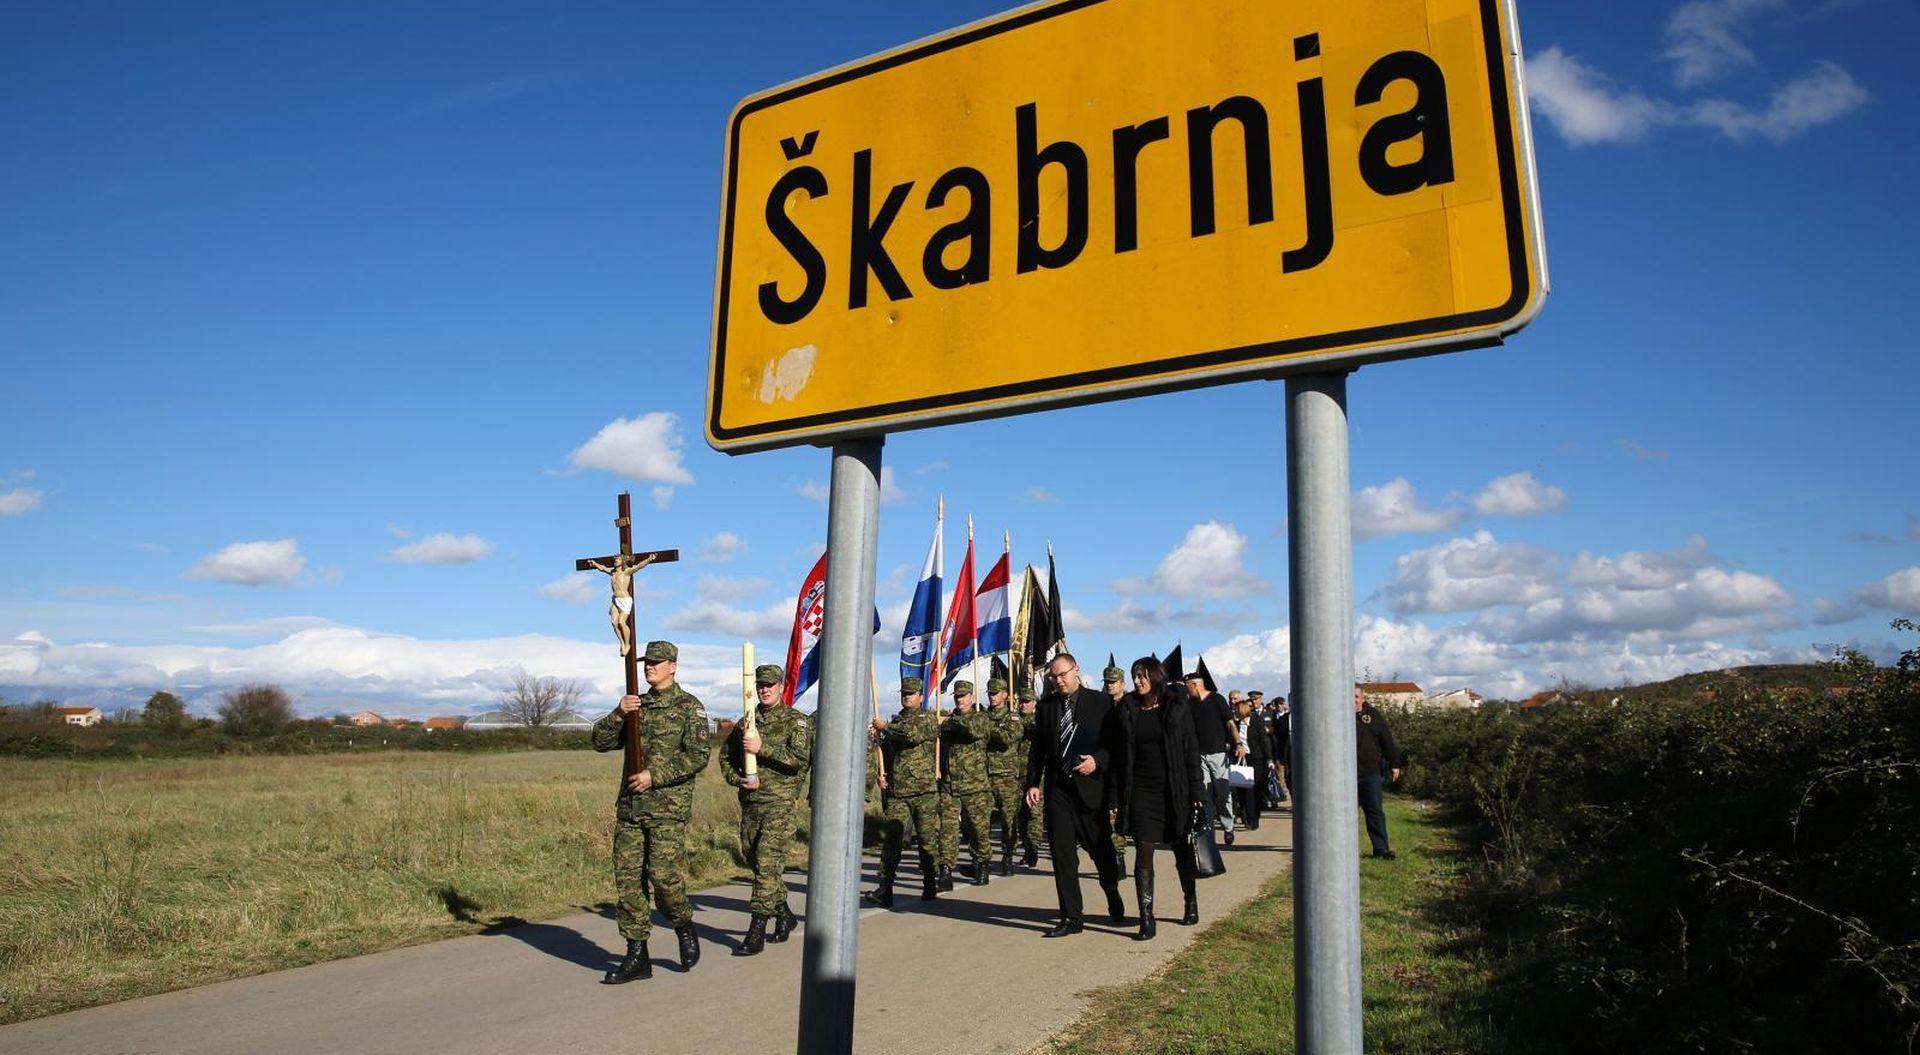 ŠKABRNJA Počelo komemorativno obilježavanje 27. godišnjice stradanja